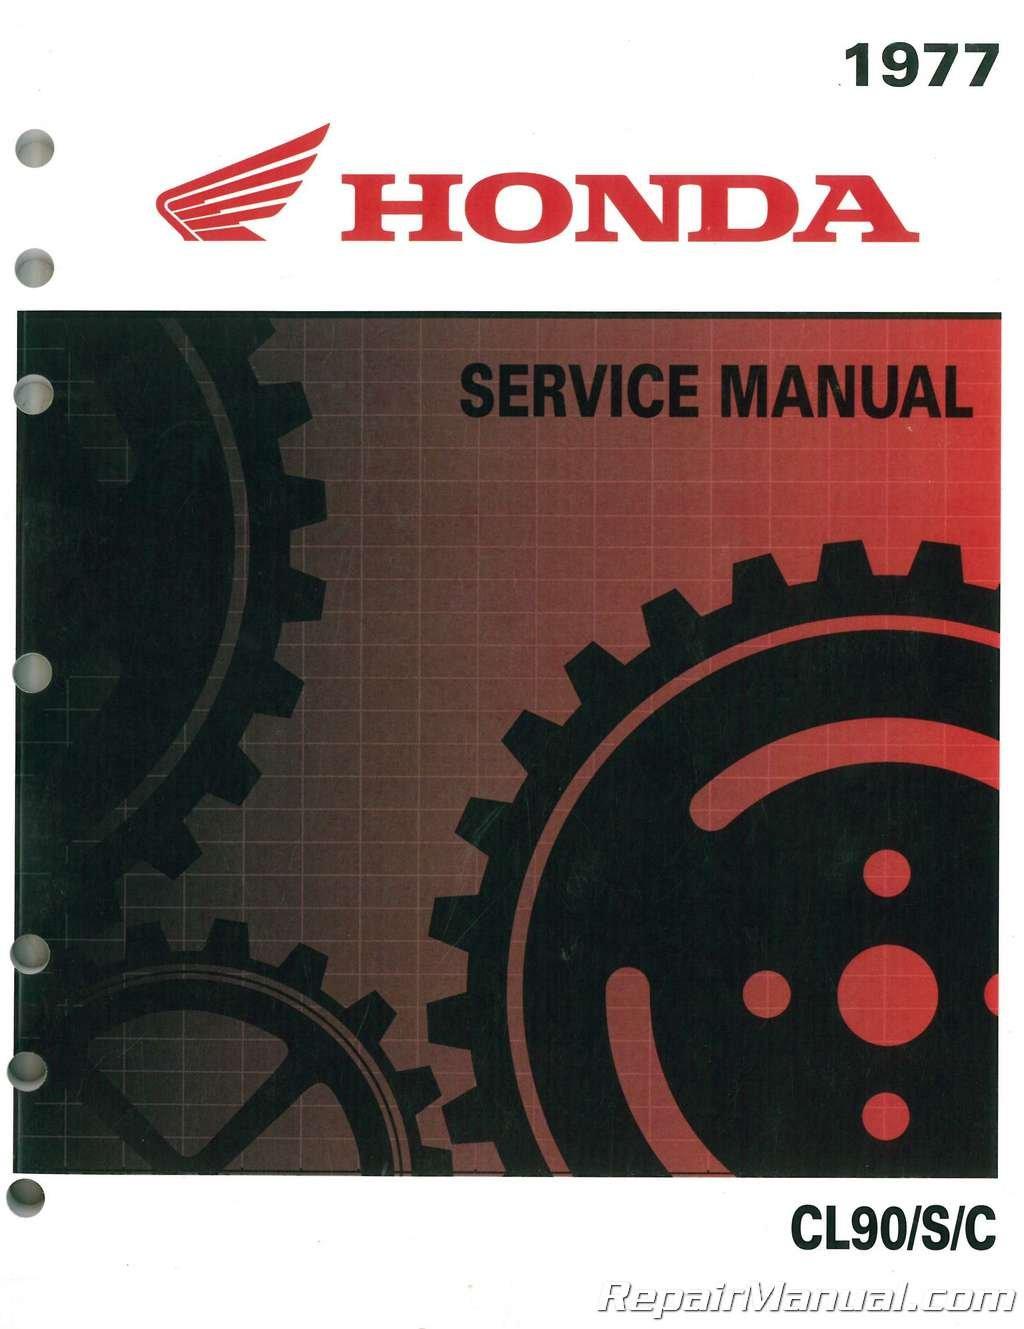 6220003 1964-1977 Honda S90 CL90 C90 CD90 CT90 CL90L Motorcycle Service  Manual: Manufacturer: Amazon.com: Books